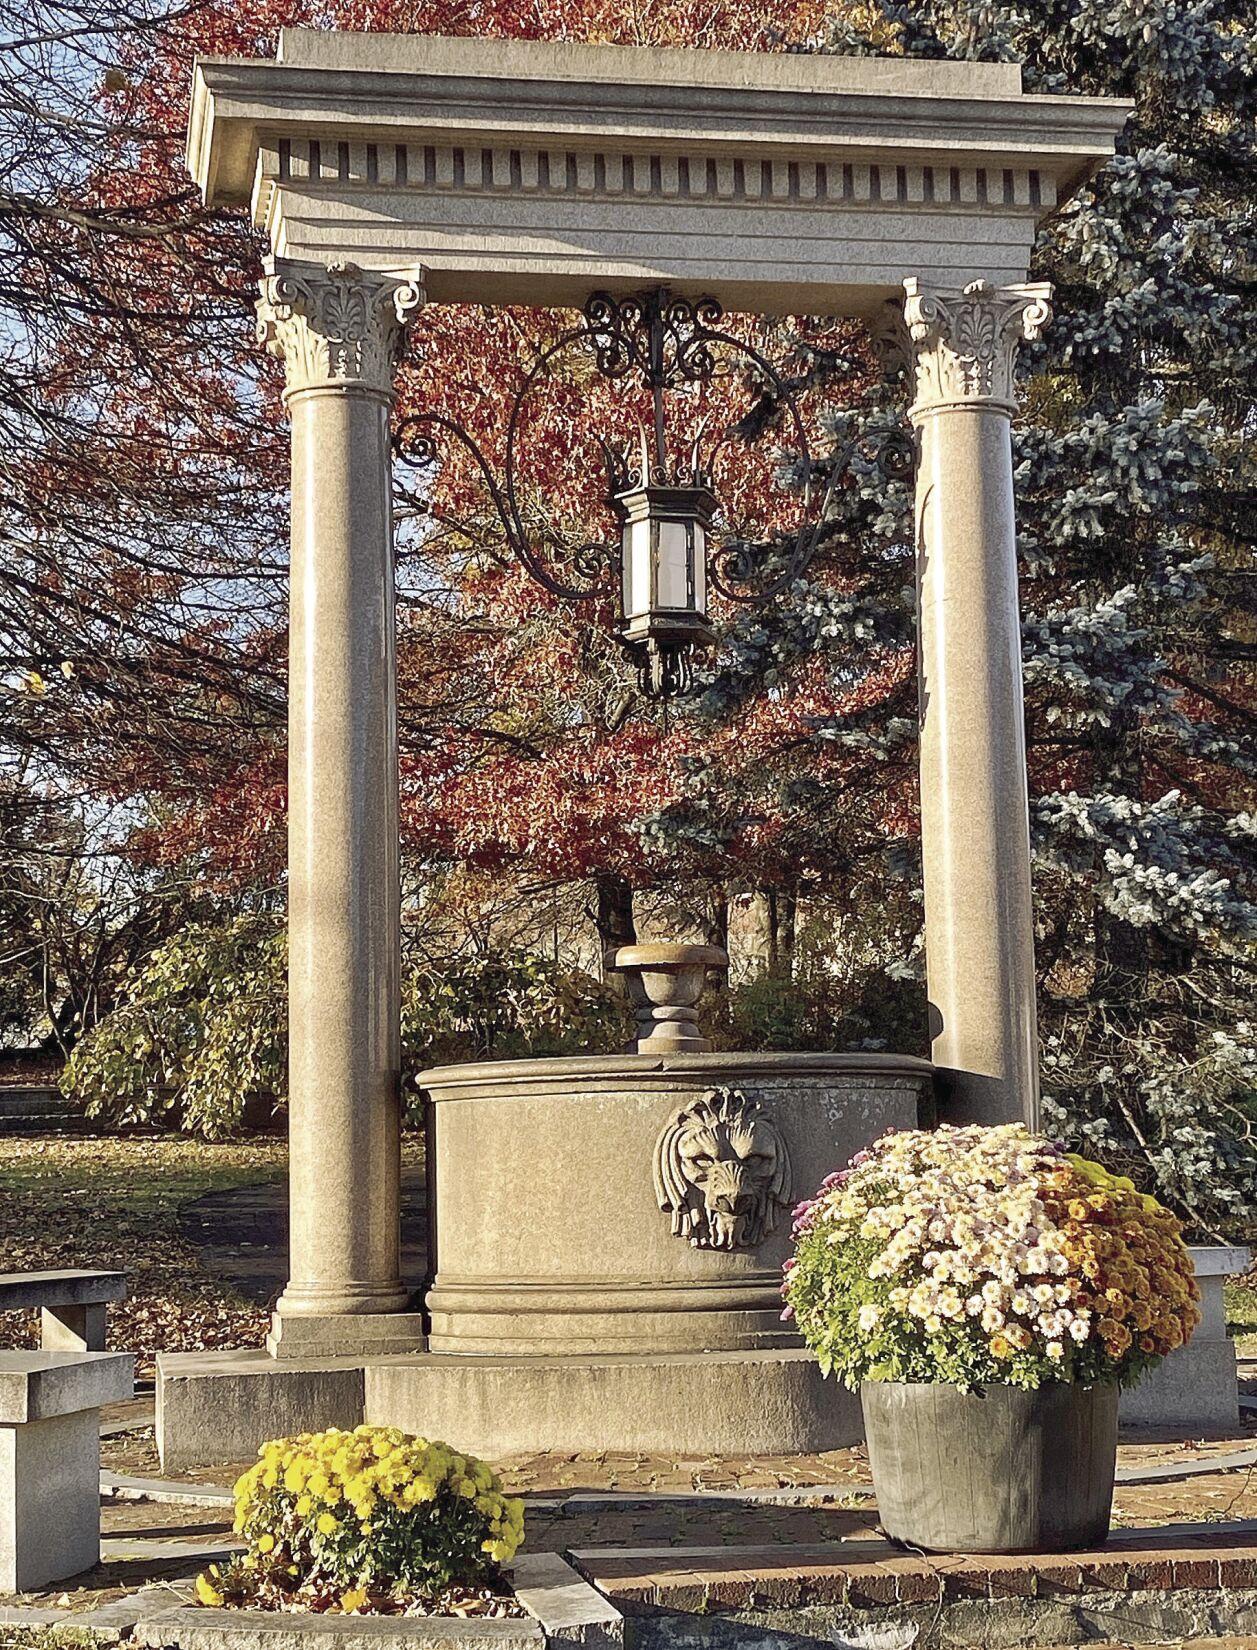 Wells Fountain - 1917 | Brattleboro Historical Society